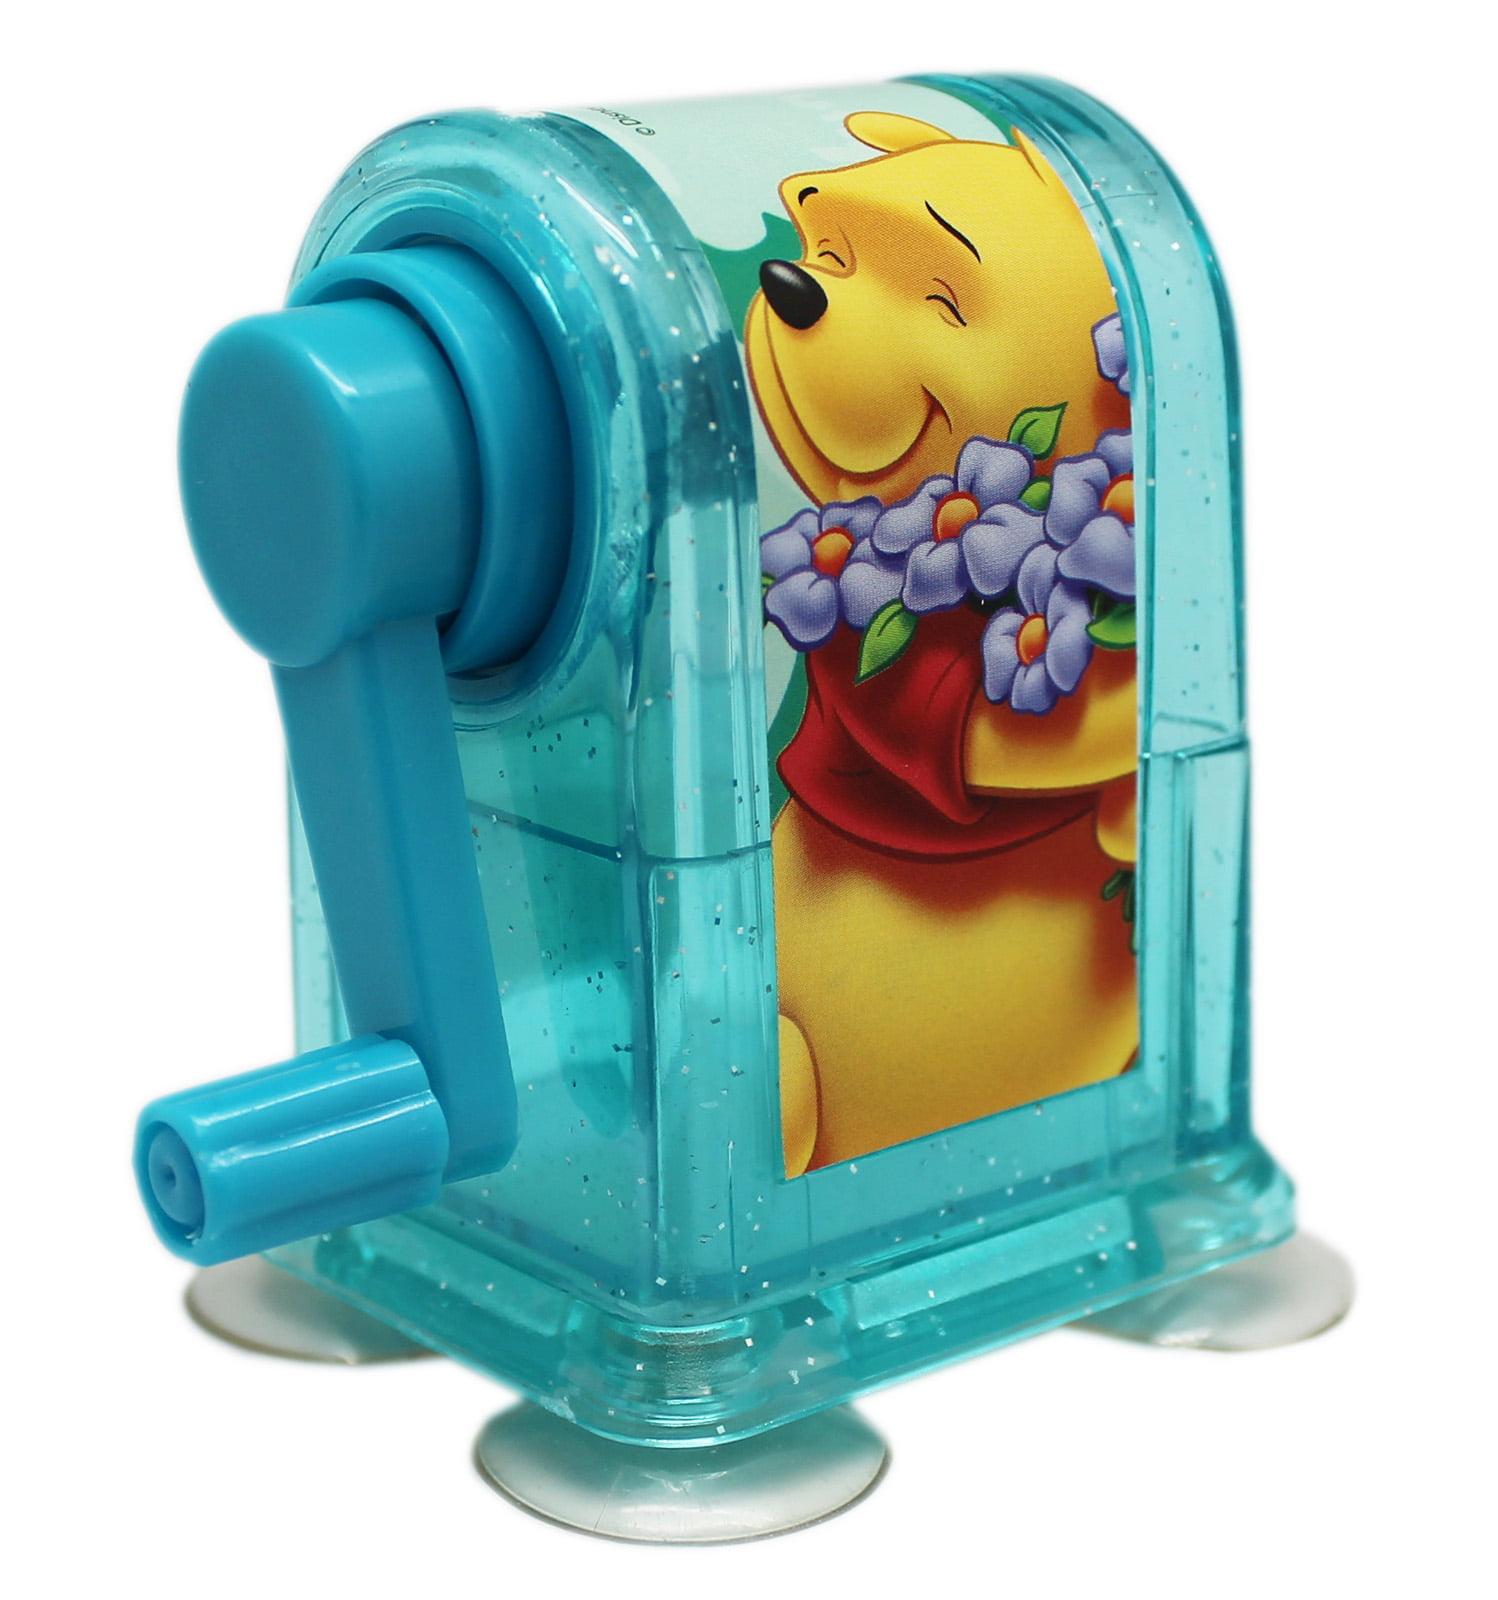 Disney's Winnie the Pooh Suction Cup Bottom Kids Plastic Pencil Sharpener